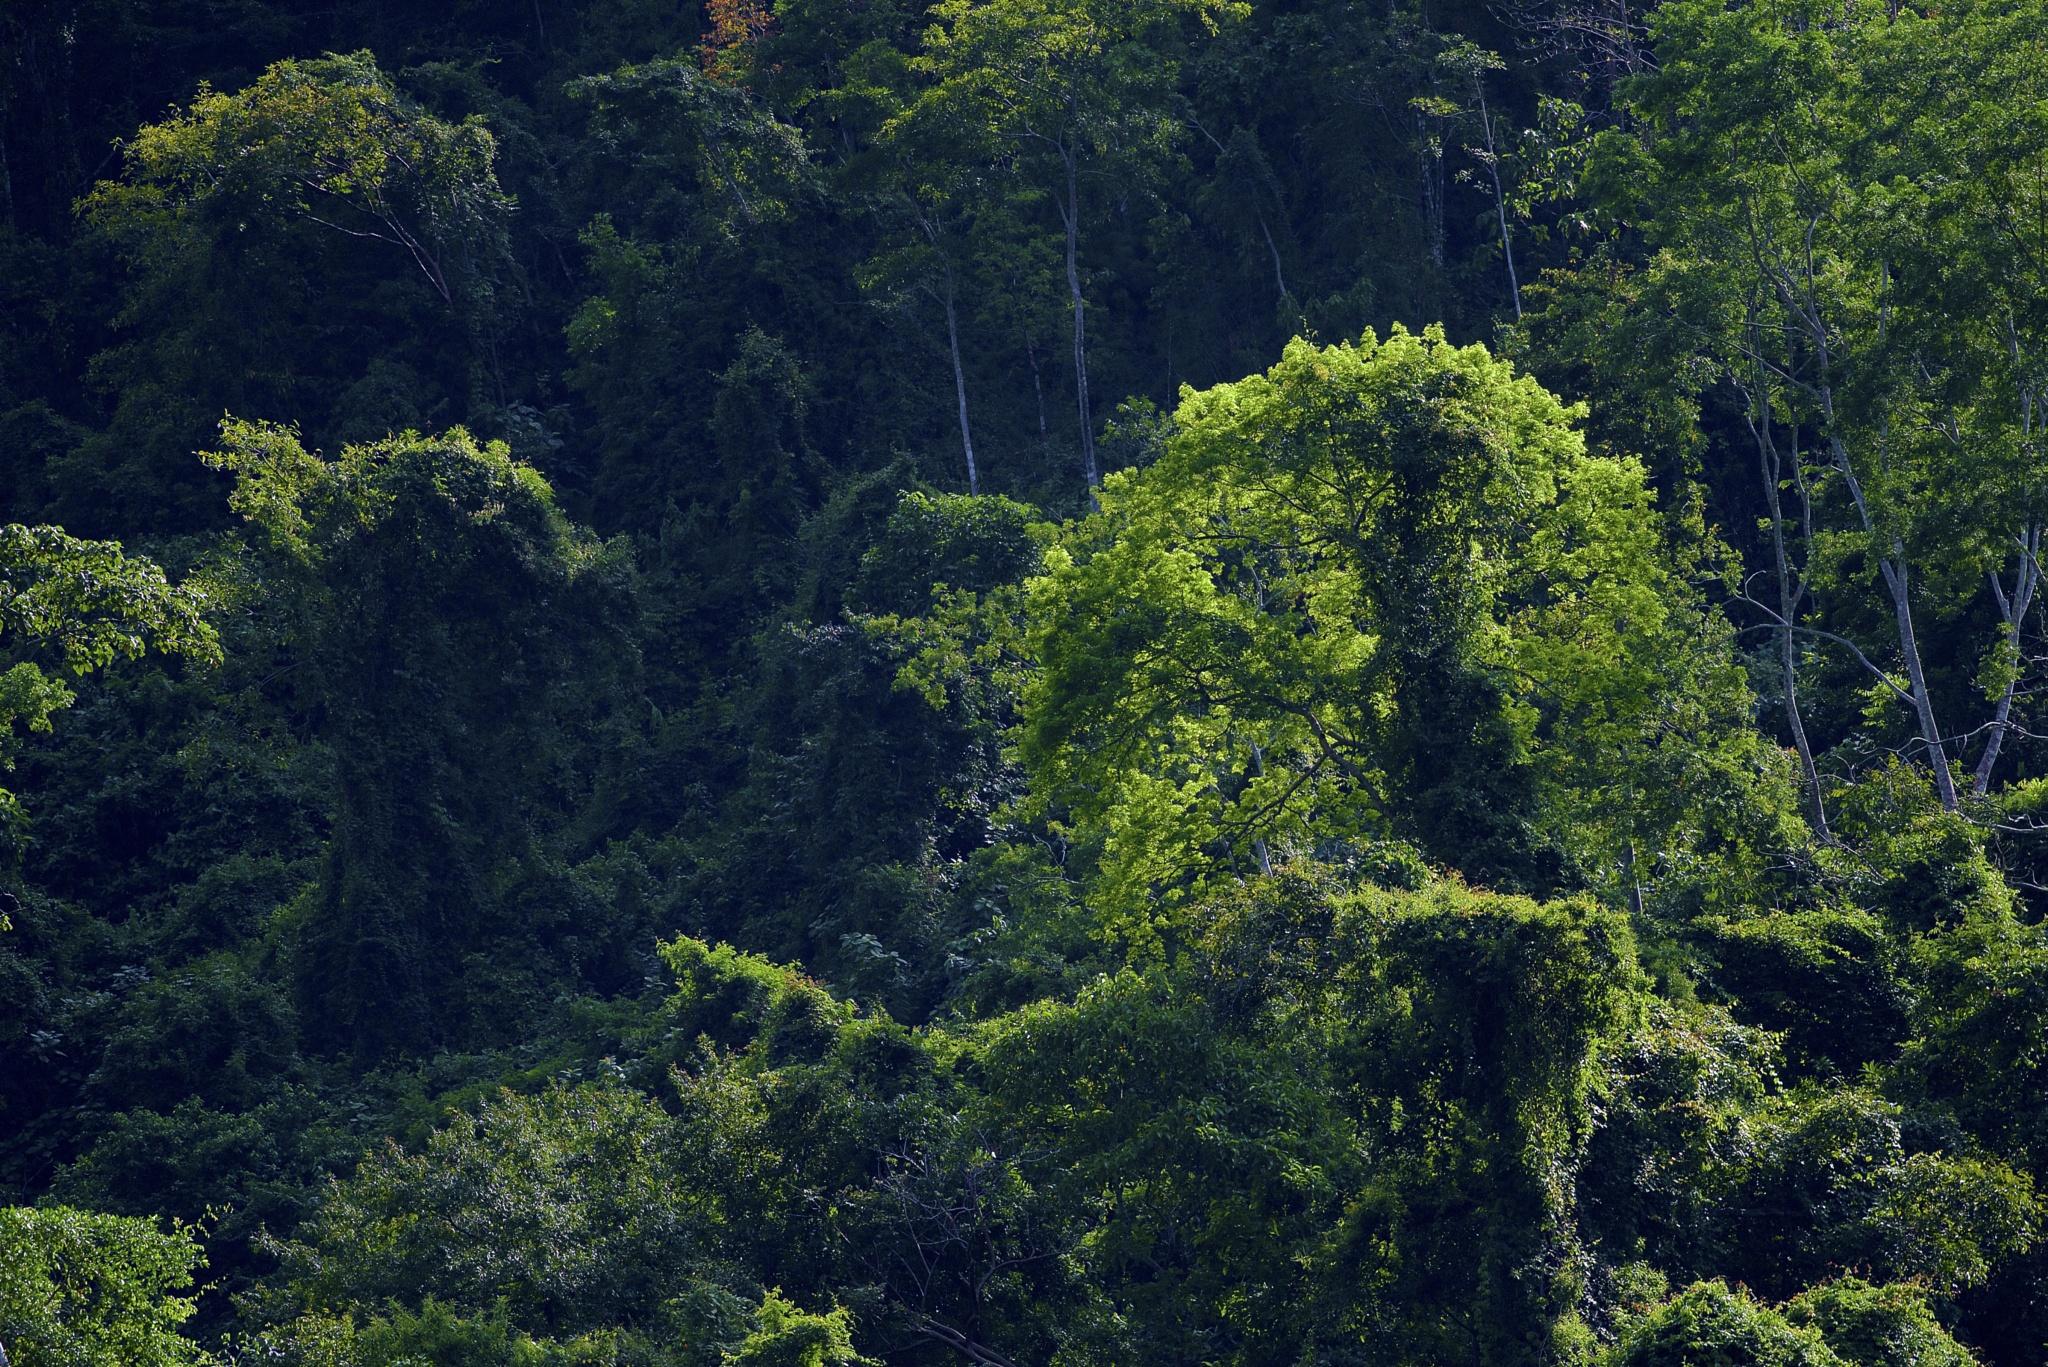 Costa Rican Rainforest by Steve Aicinena